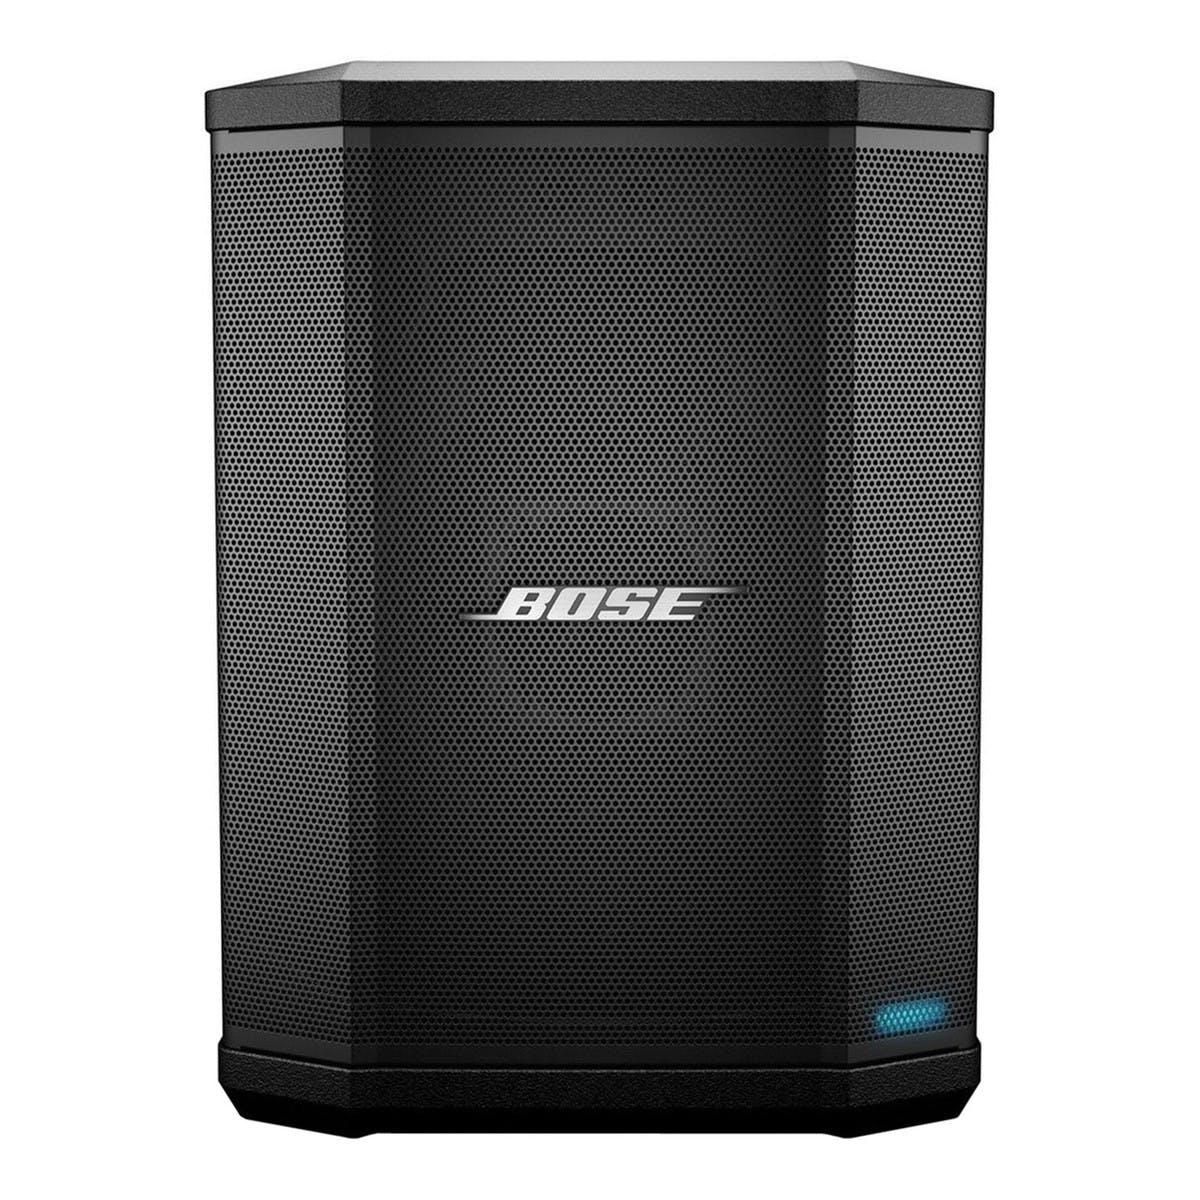 Bose S1PRO System